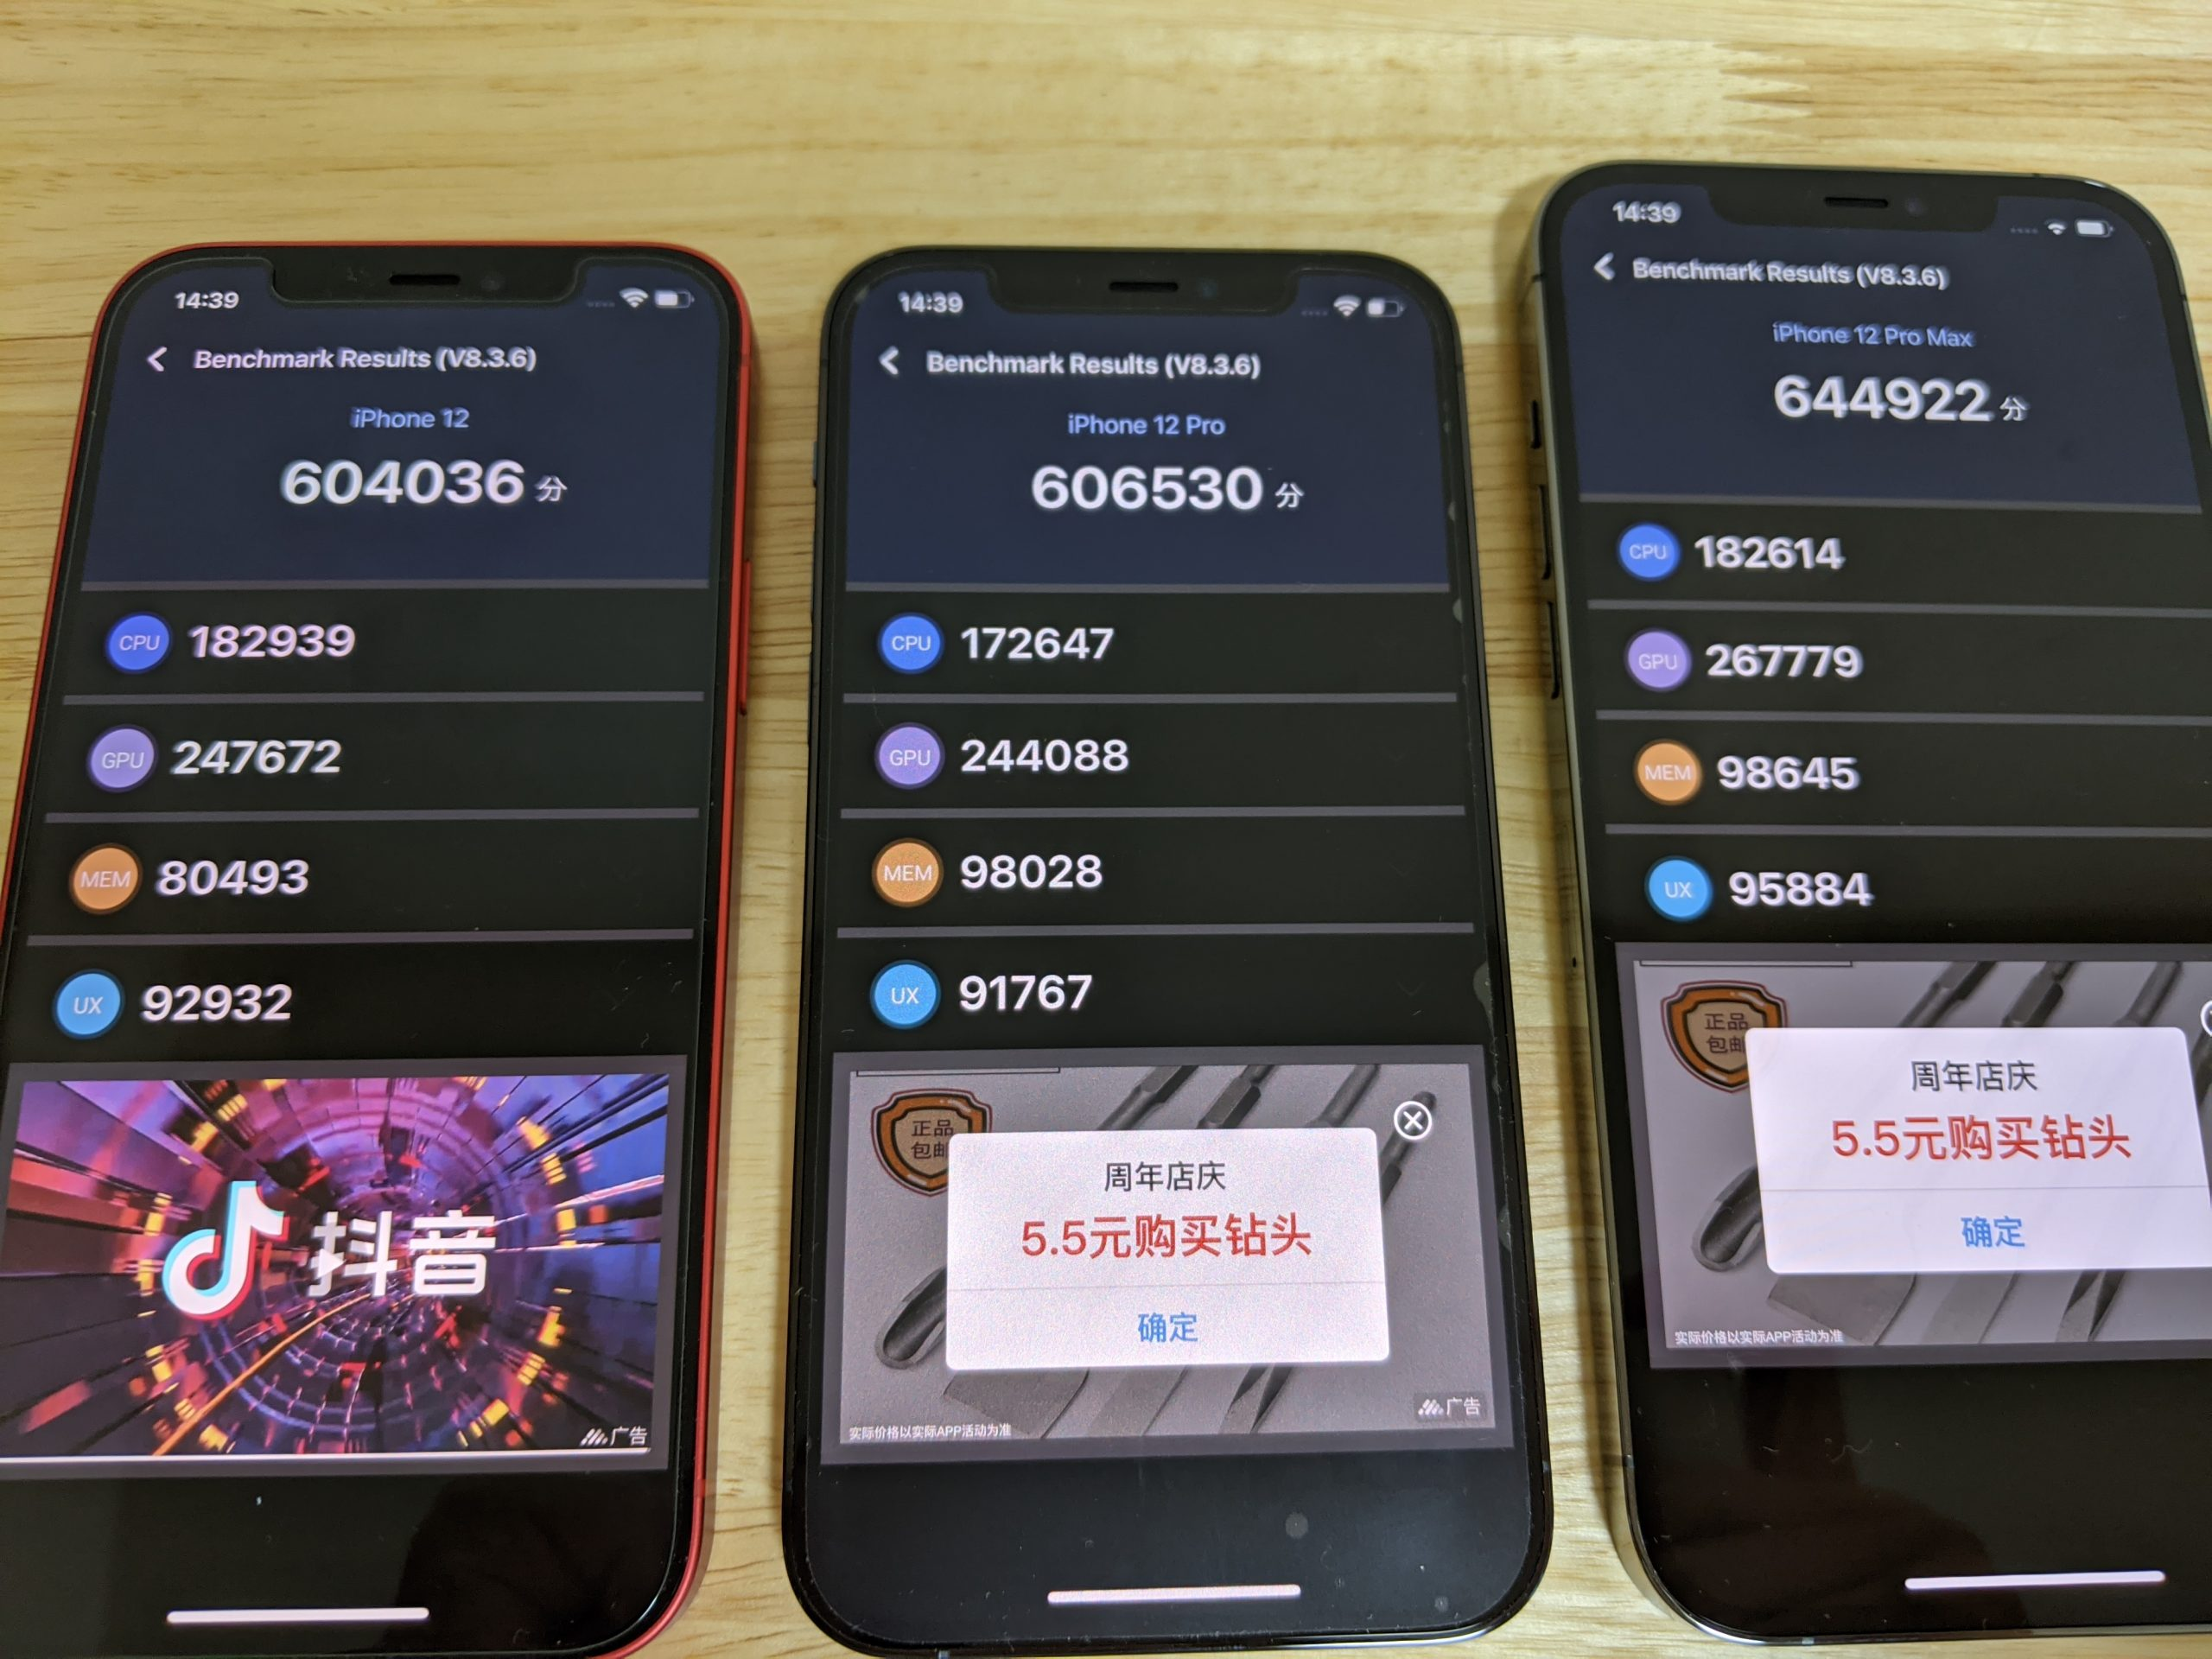 iPhone 12 Pro Max 実機レビュー20